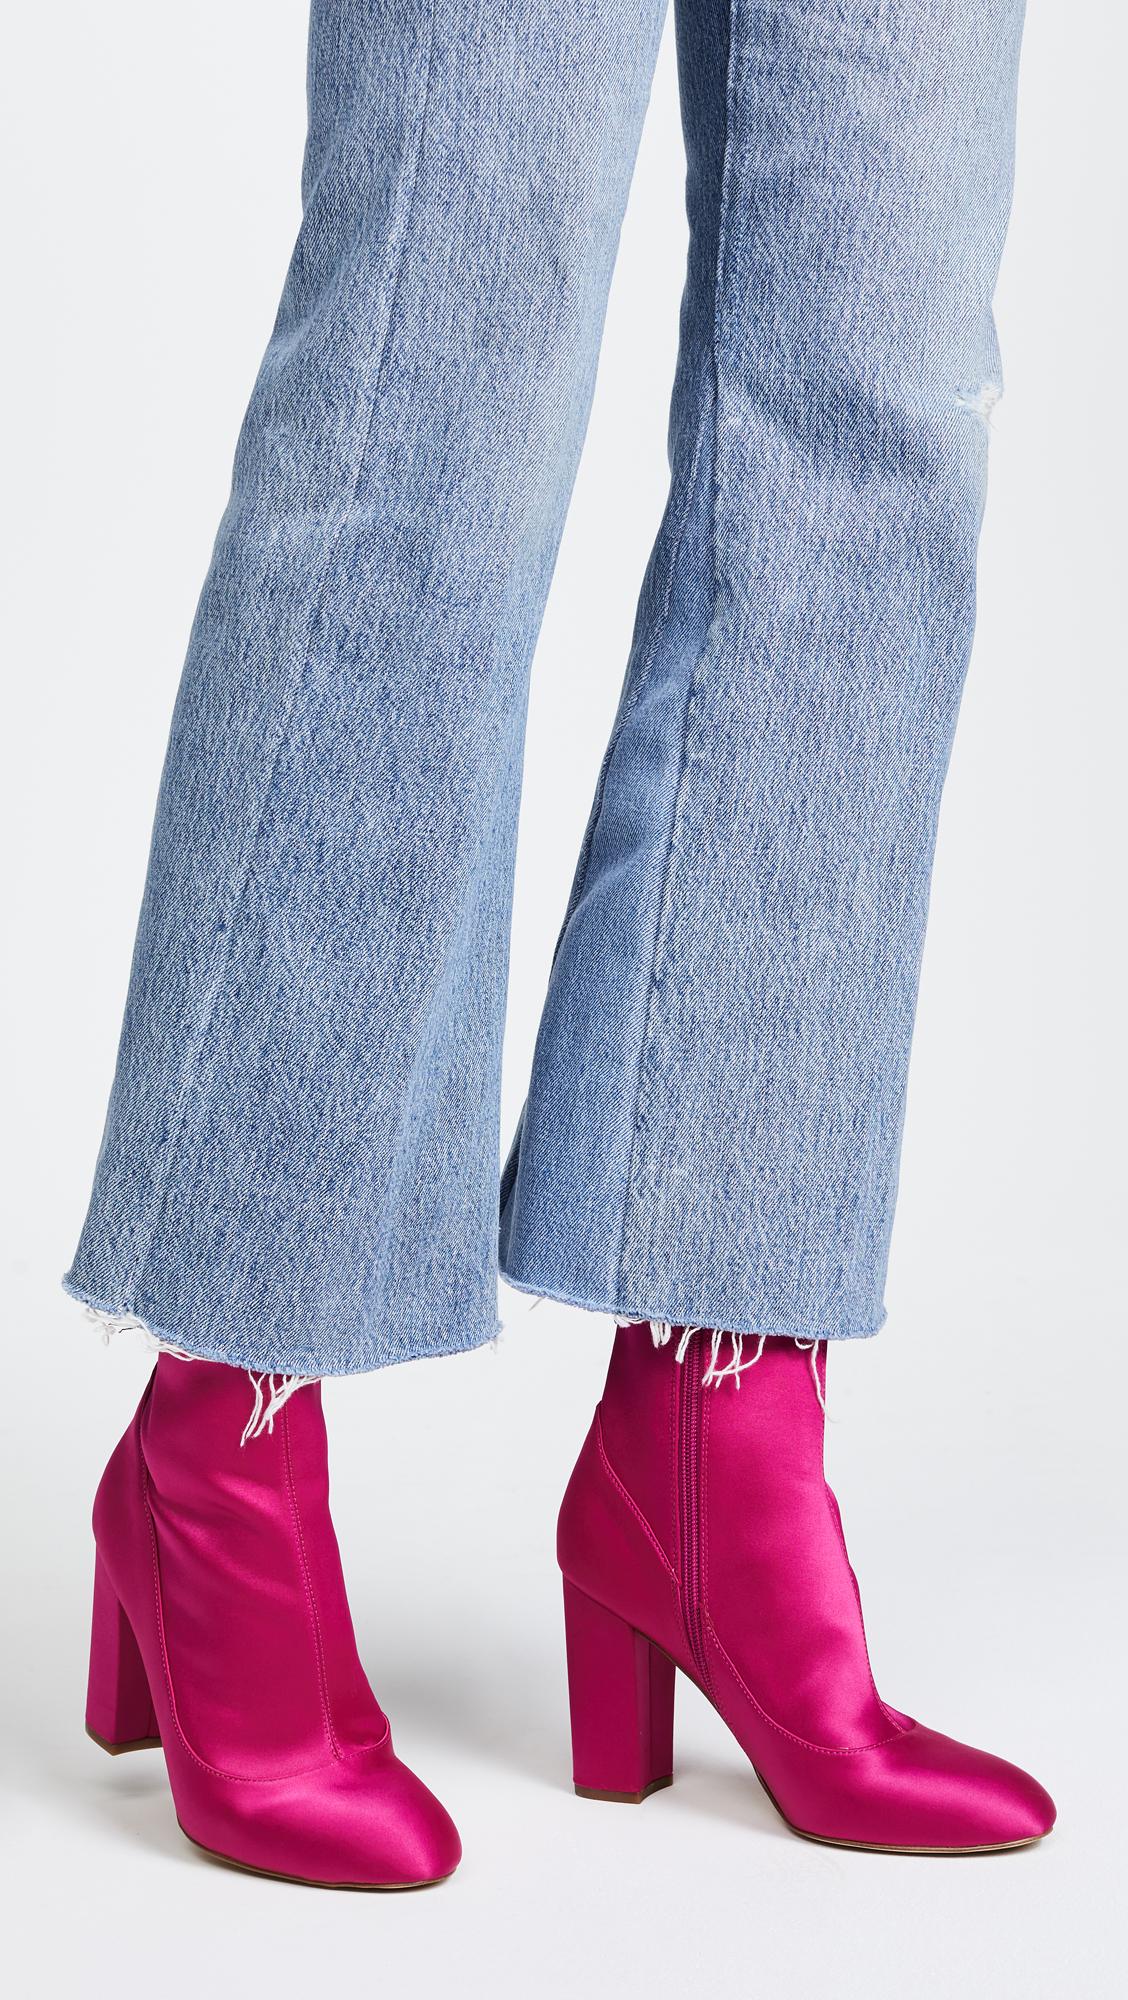 7be0c33da Sam Edelman Calexa Sock Booties